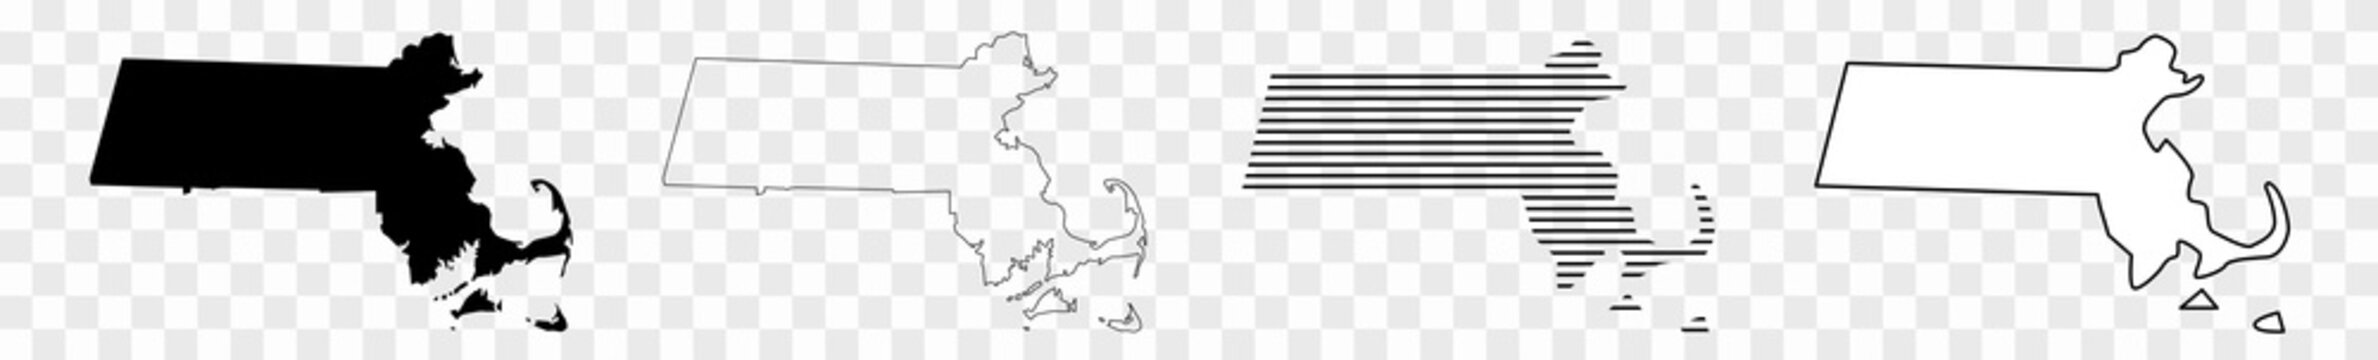 Massachusetts Map Black | State Border | United States | US America | Transparent Isolated | Variations